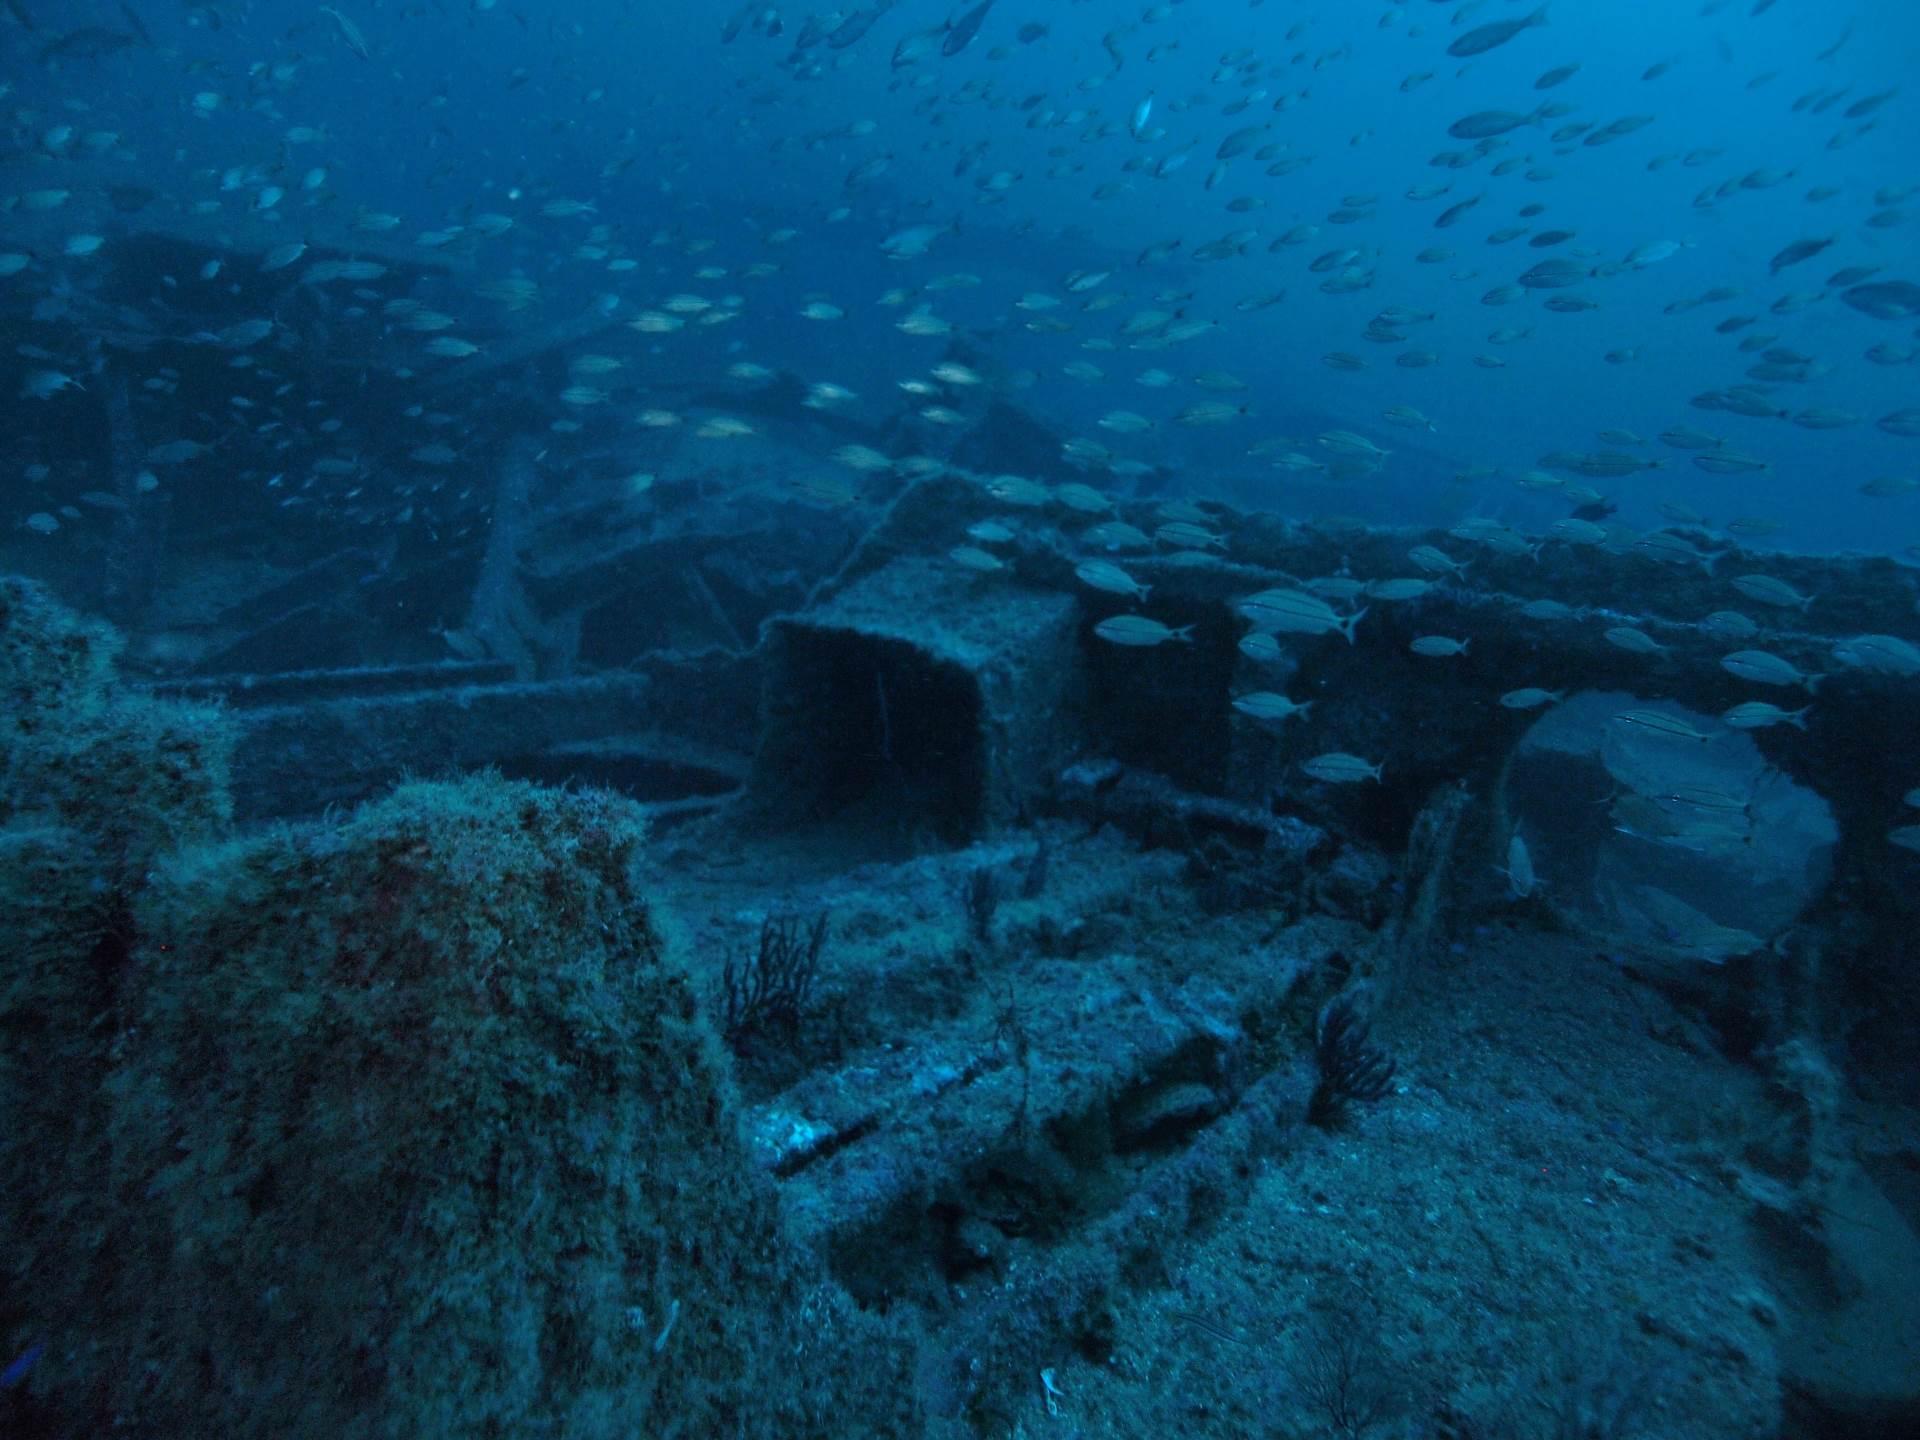 Wreck debris mid ships area of the Manuela, sunk WW2.